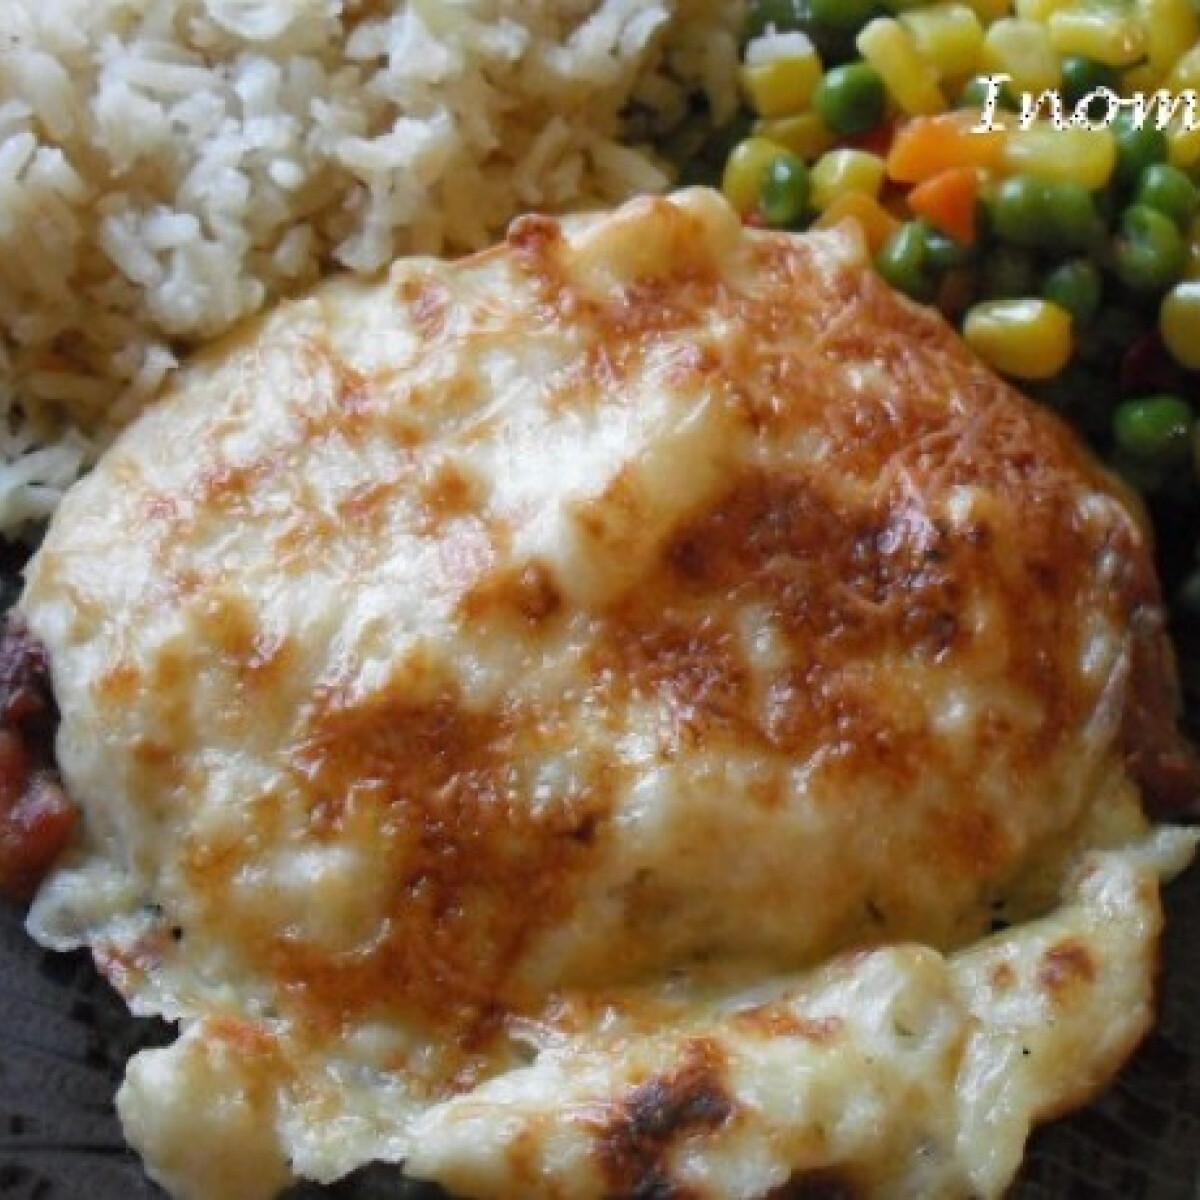 Karfiolkrémes csirkemell